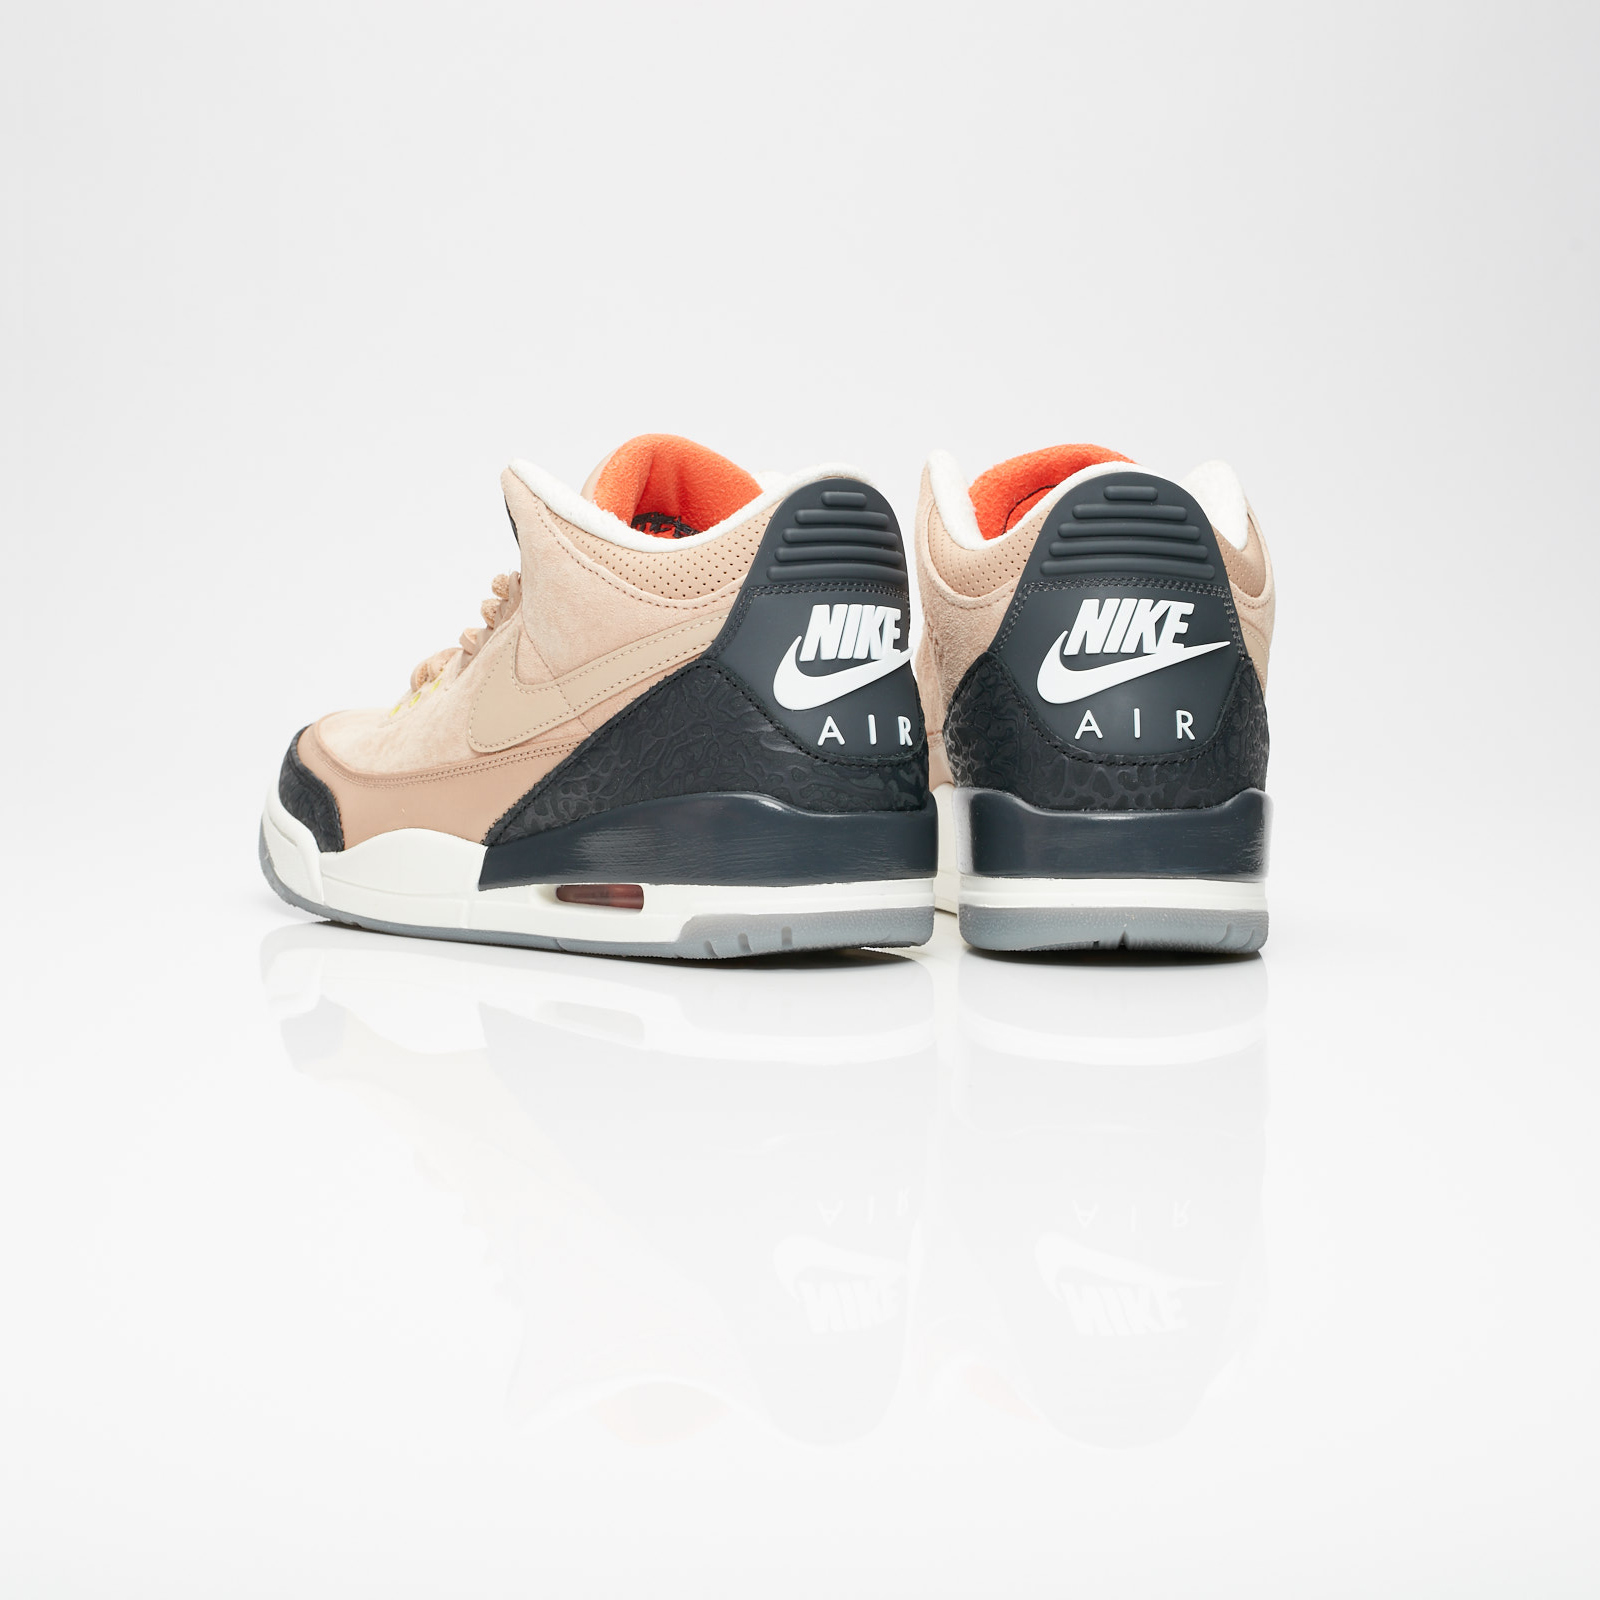 99c5d4c228a Jordan Brand Air Jordan 3 Retro JTH NRG - Av6683-200 - Sneakersnstuff    sneakers & streetwear online since 1999